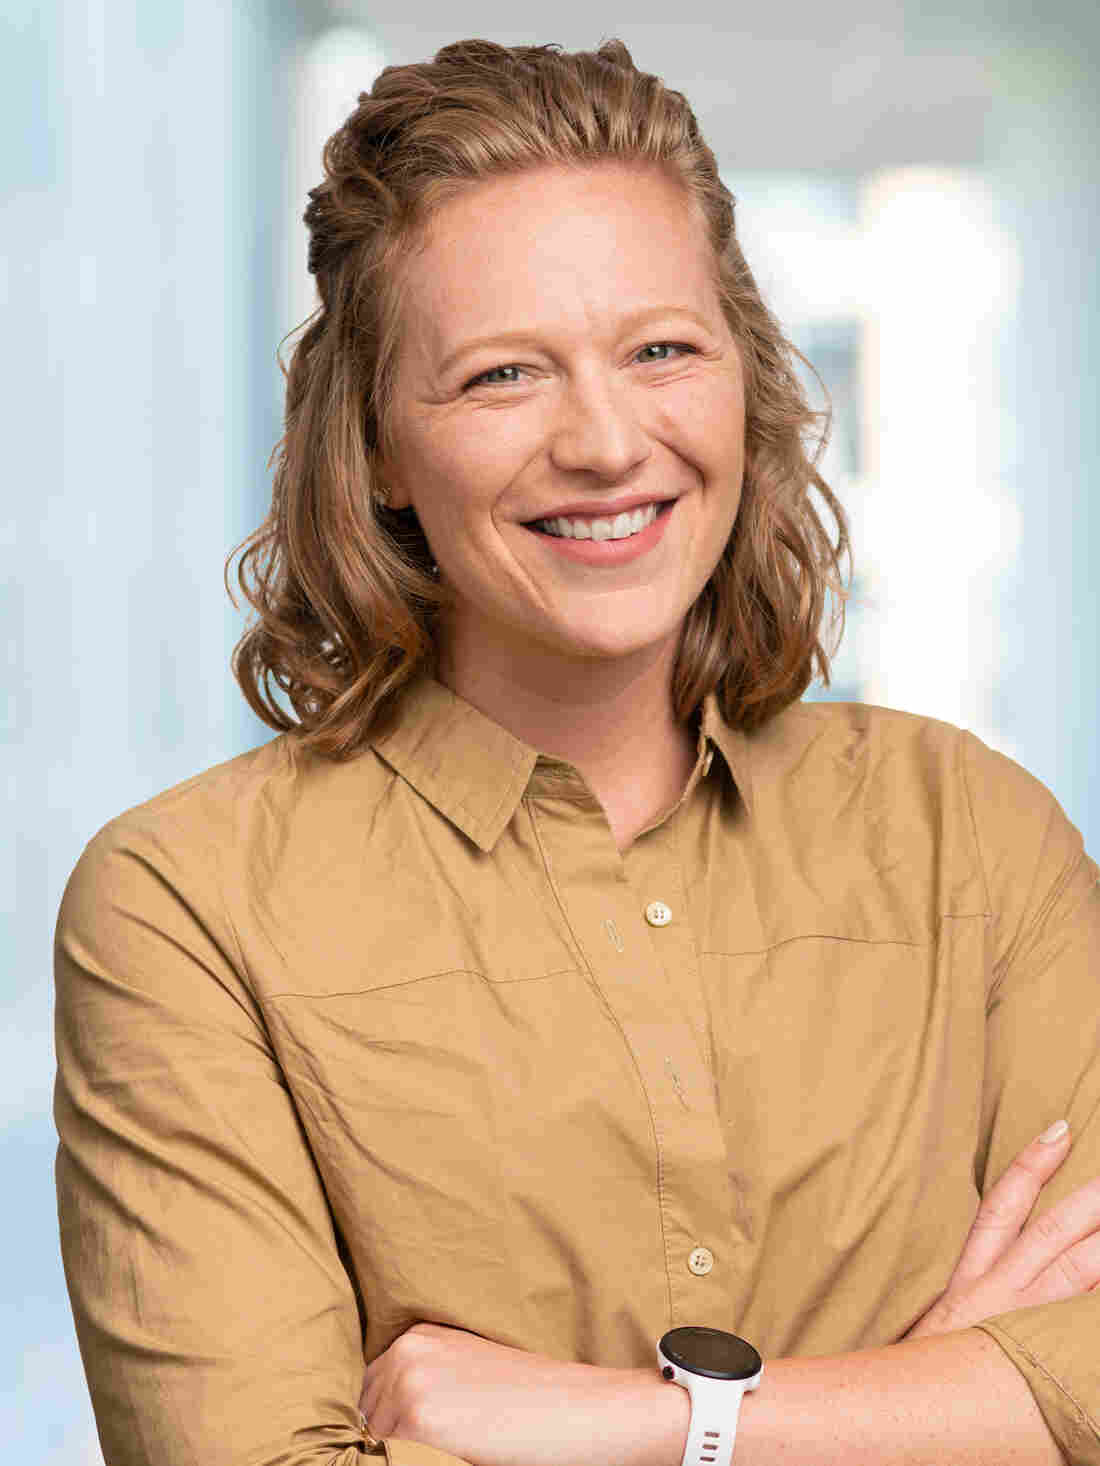 Lyndsey McKenna, photographed for NPR, 19 September 2019, in Washington DC.